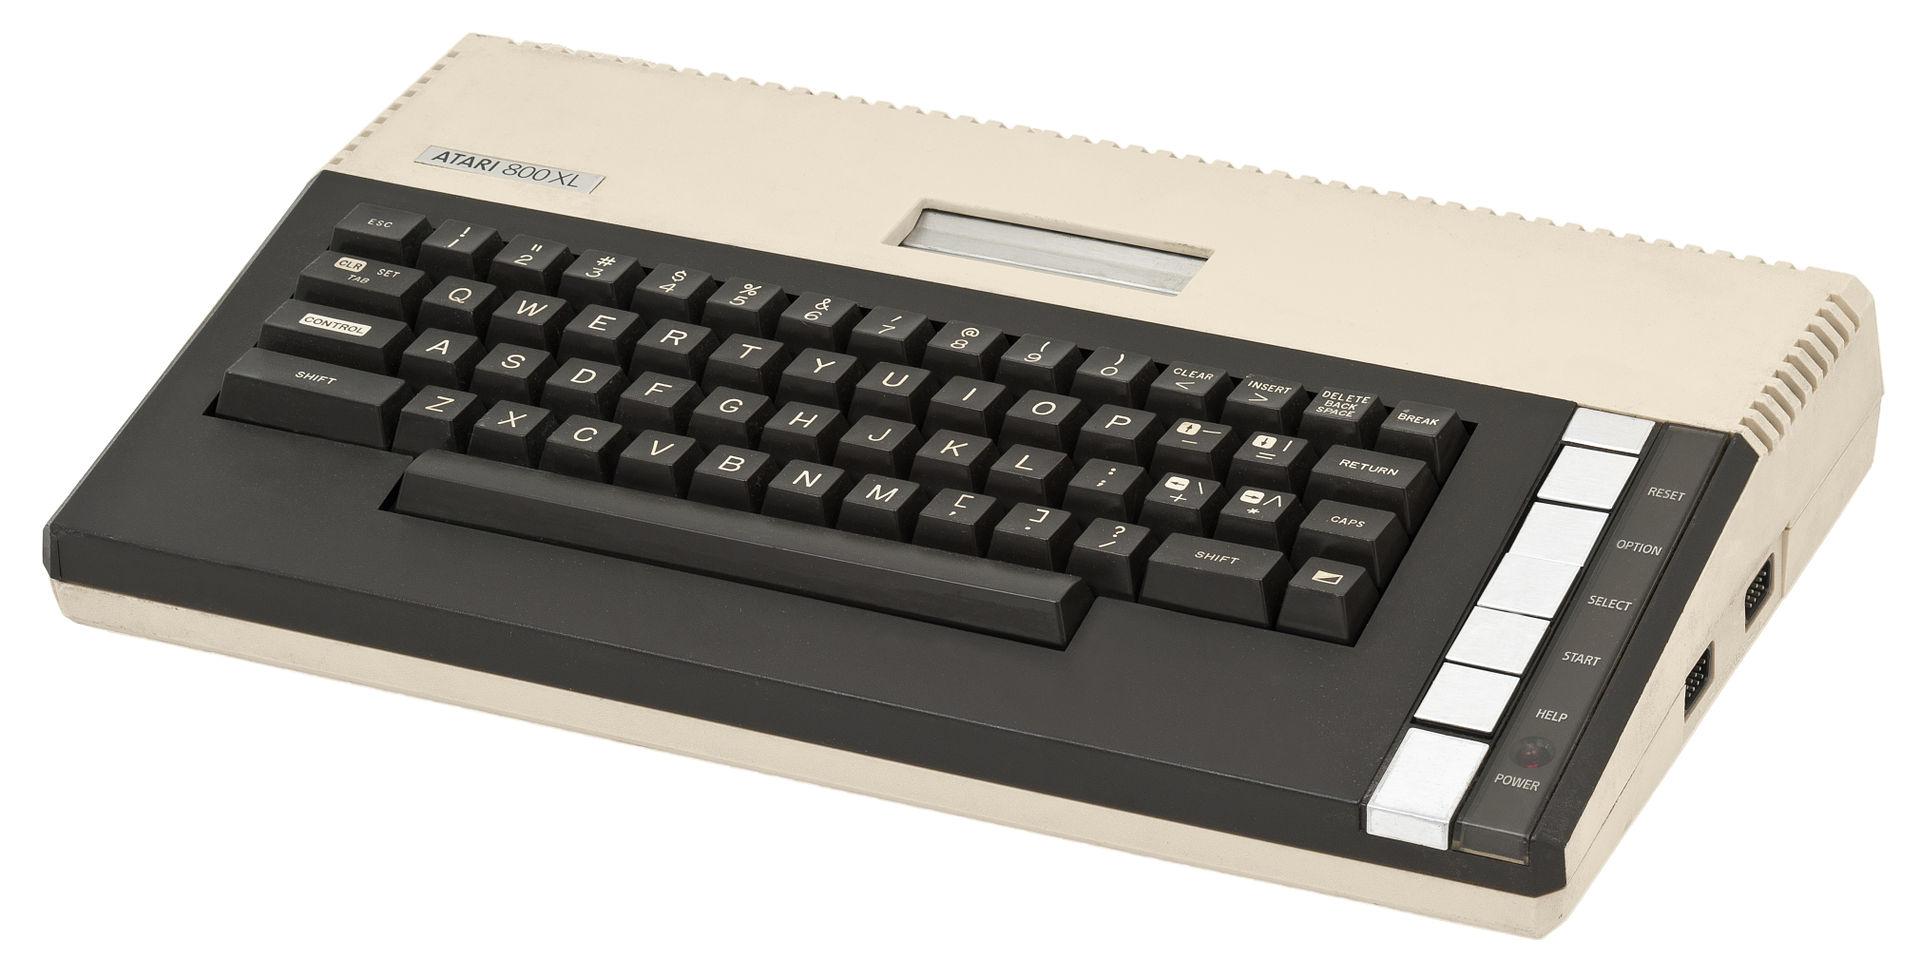 LTQ1MDcxJTB-AH11W0F1Y2UBfWlSTXhkYQl0dVVPYzUlUD8tThk4NSNYYHxTSDQ4f1s9Iw== Como vez has jugado. Atari, Amiga, ZX Spectrum y otros objetos retro.